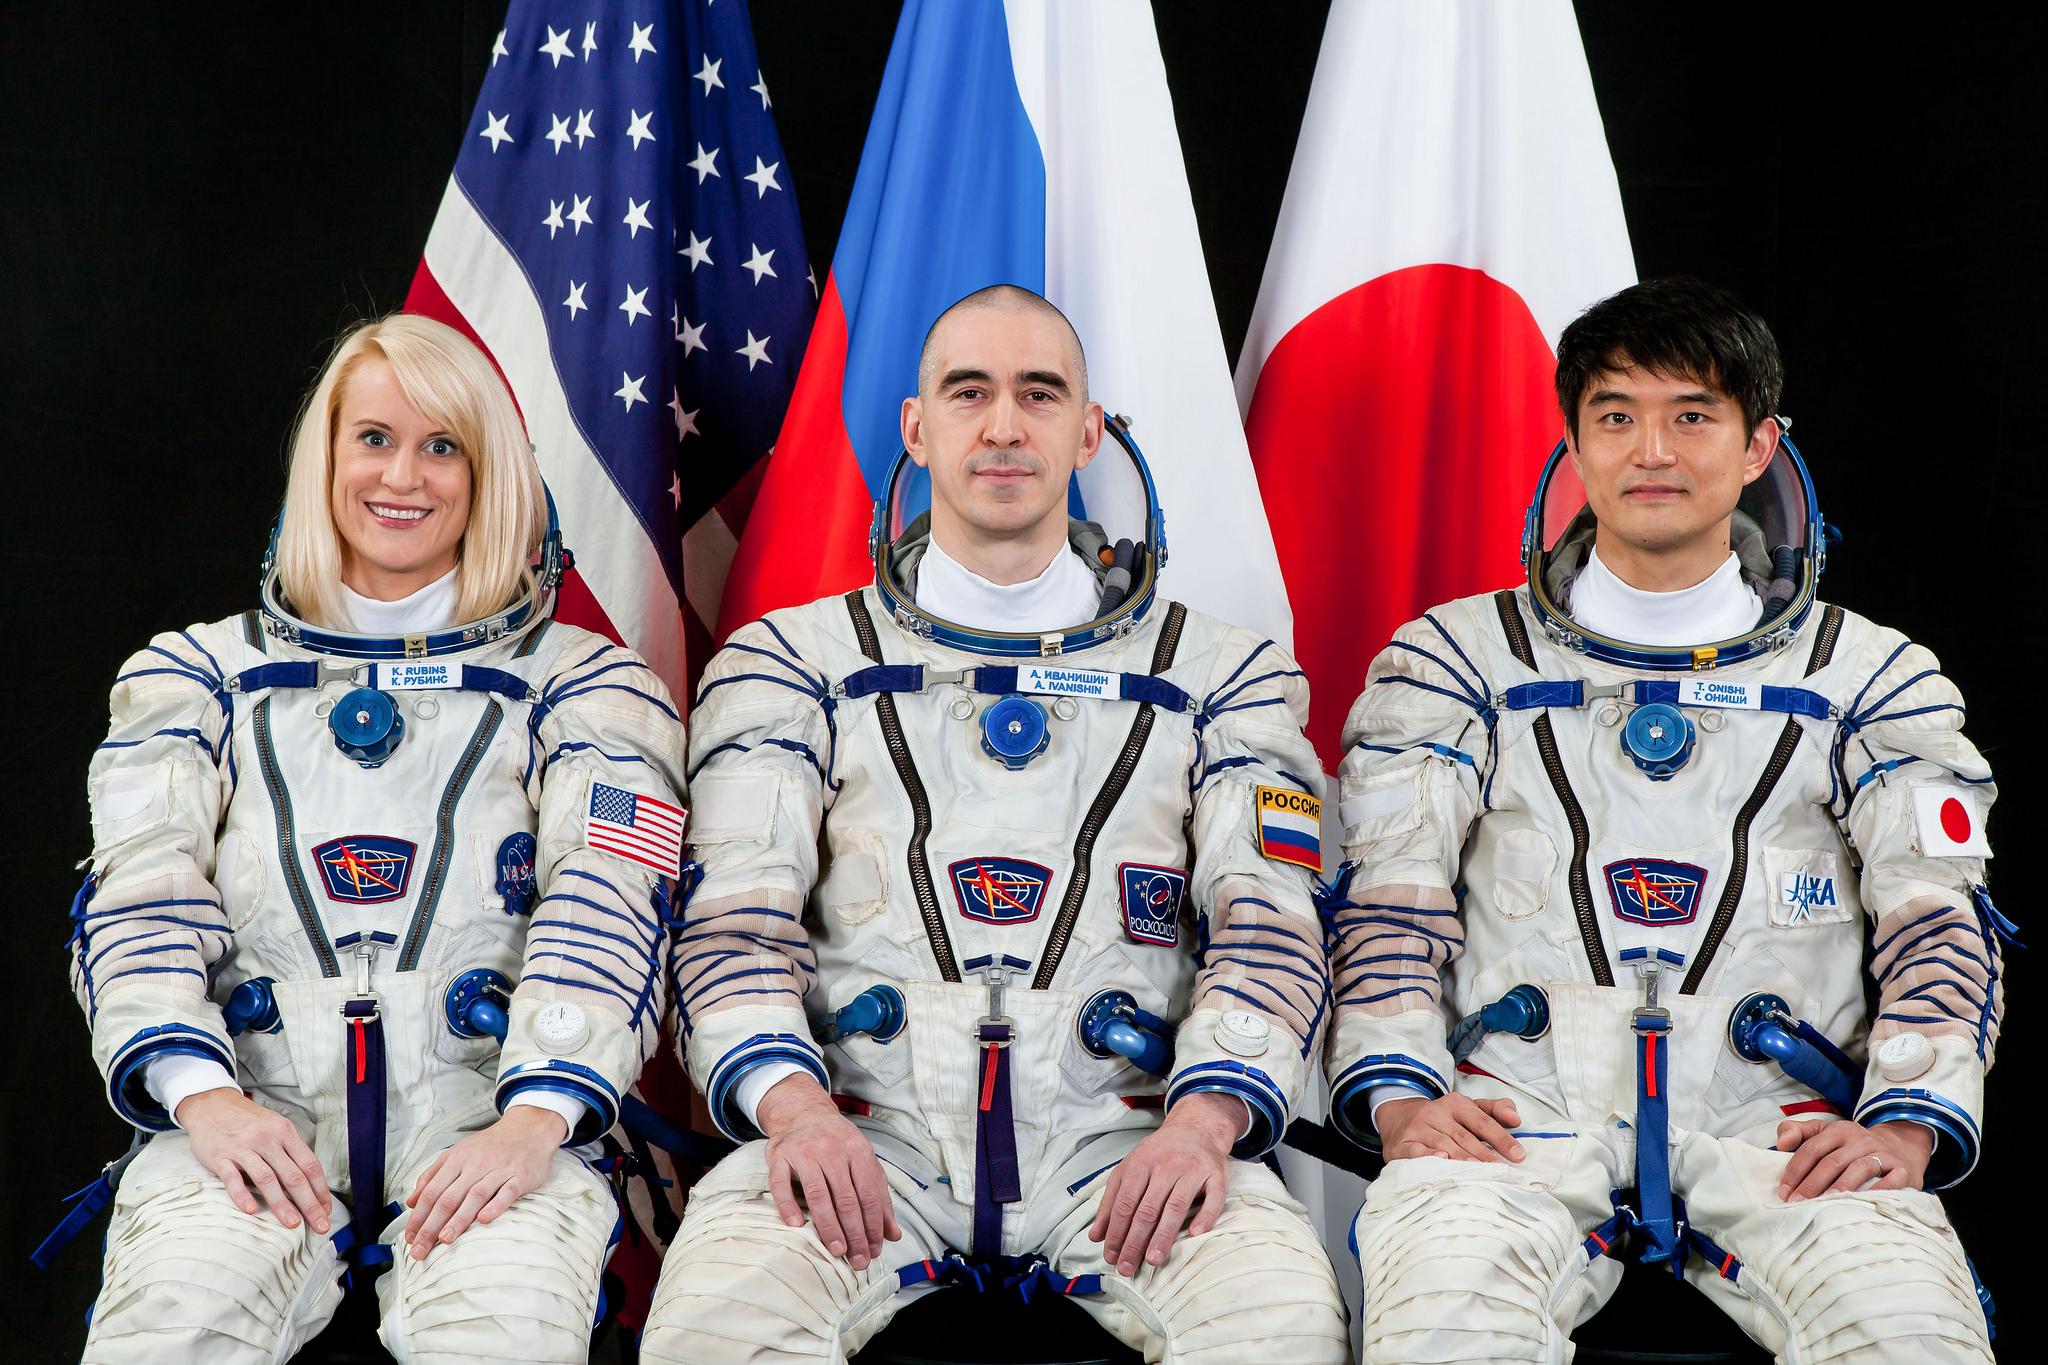 astronaut space team - photo #43